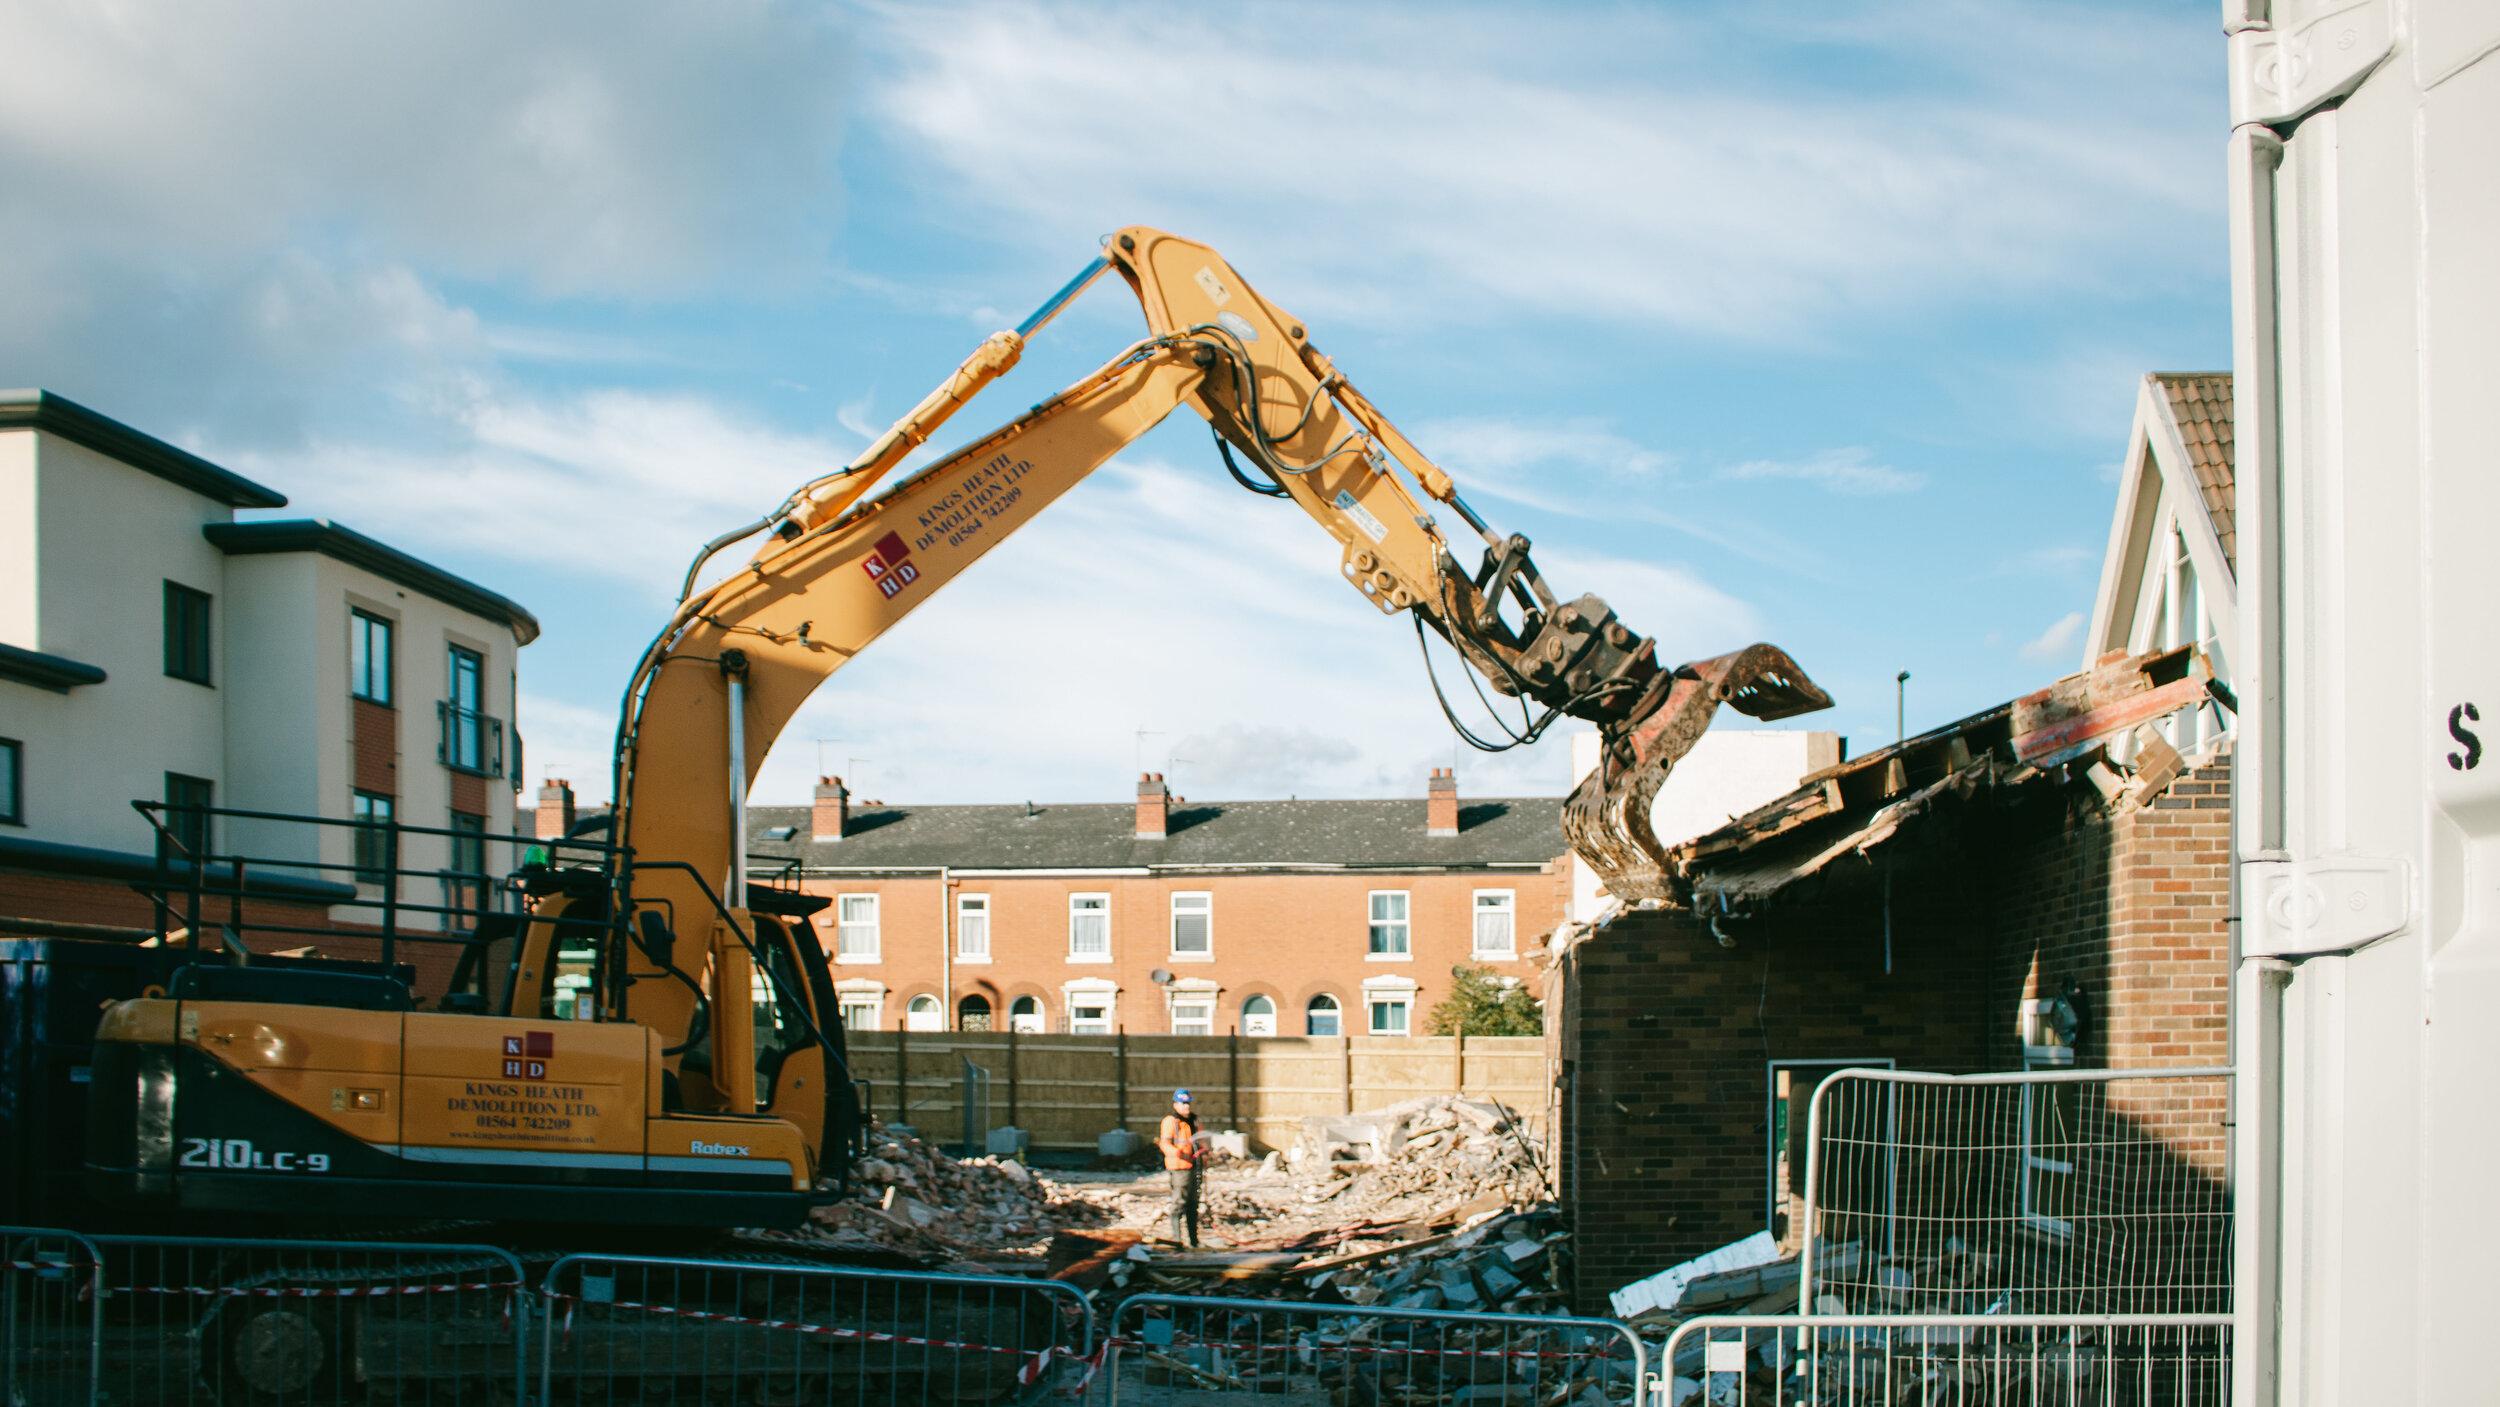 st-johns-harborne-bfm-demolition-oct-19-eo-2999-low.jpg